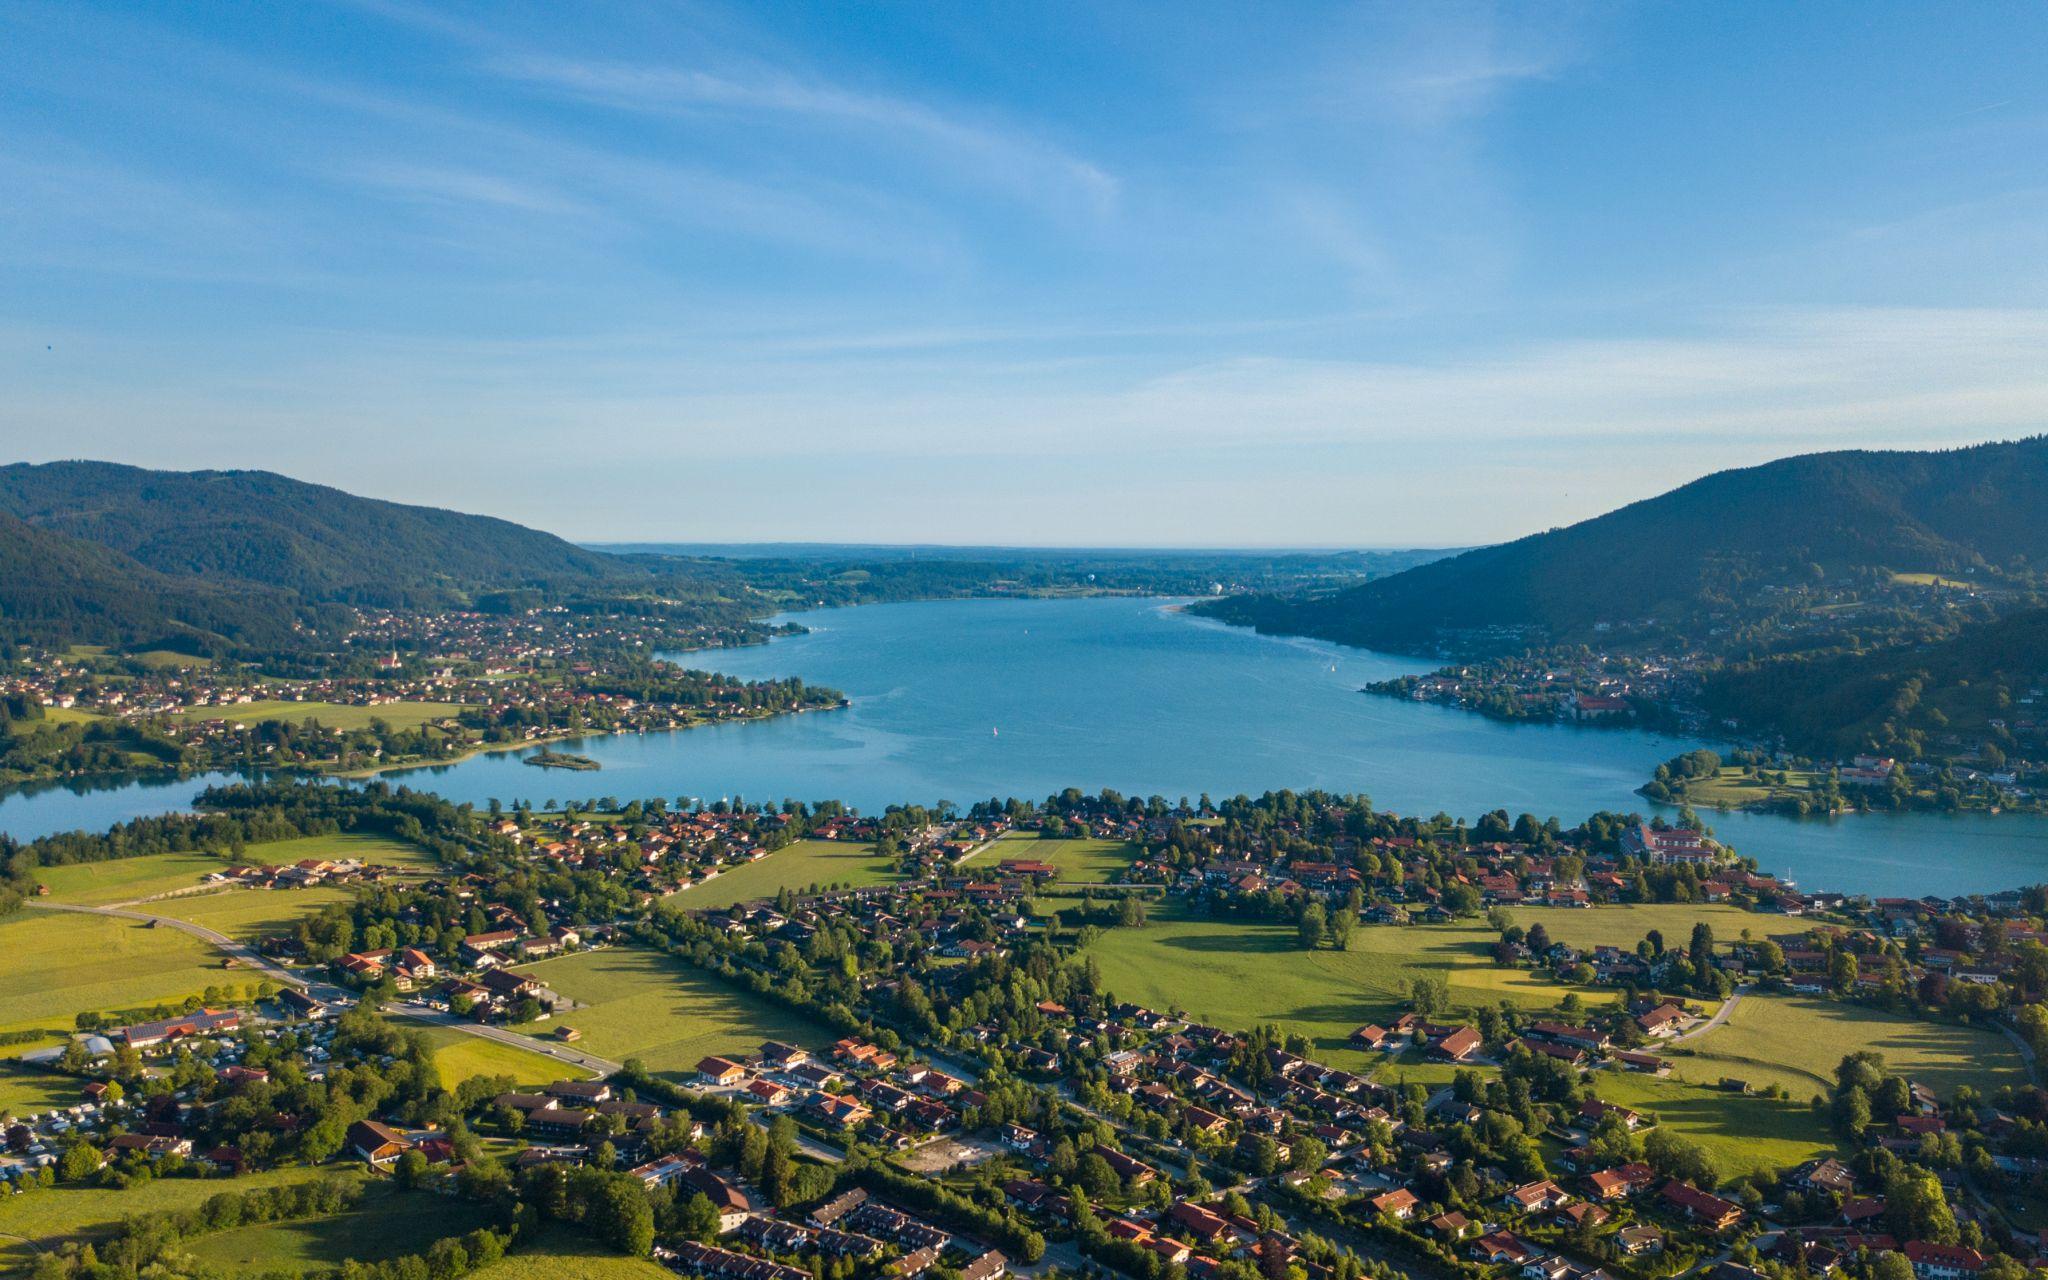 Targensee, Germany